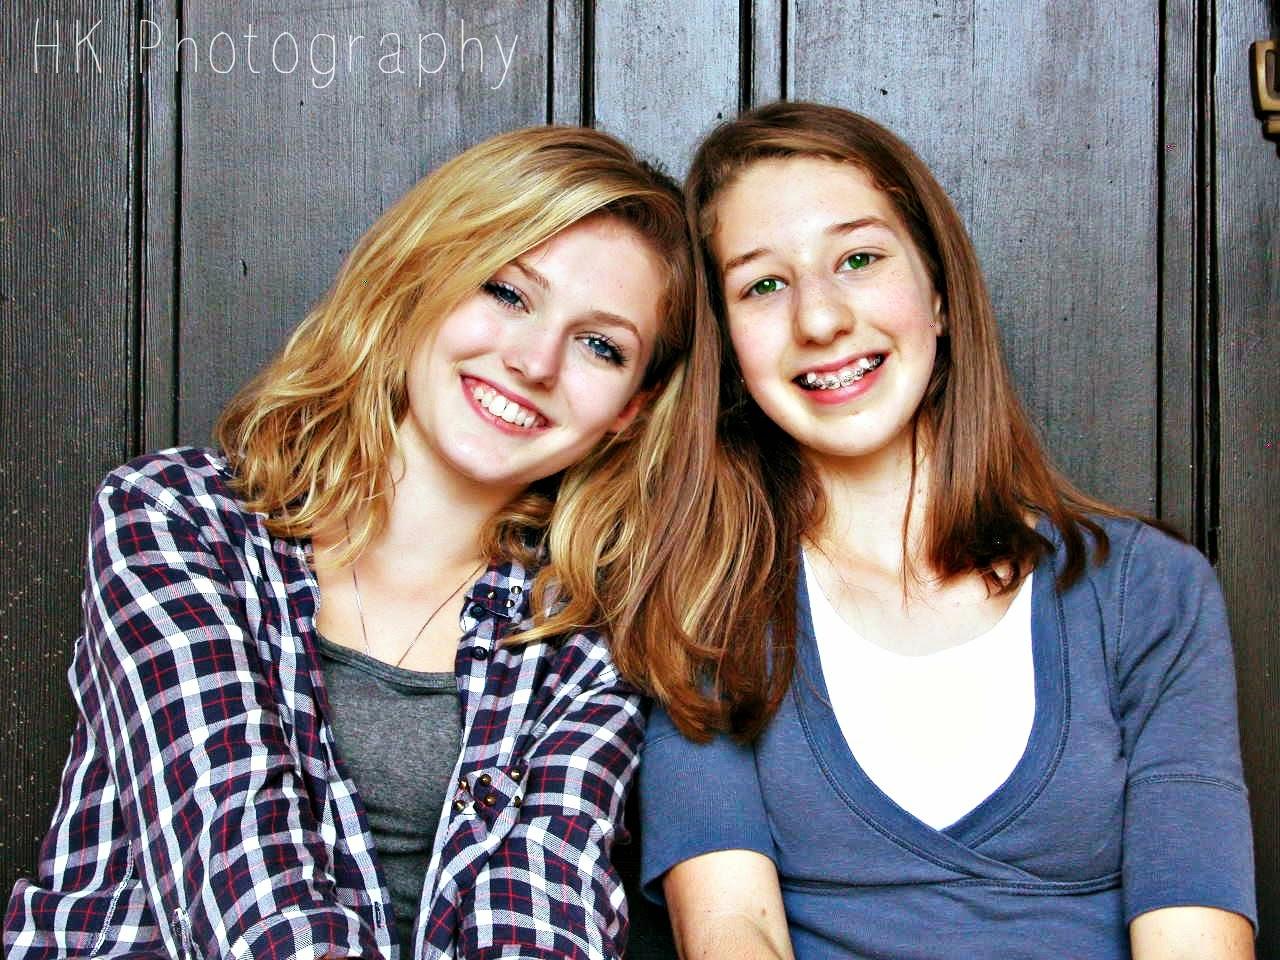 Photoshoot- http://pimplesandfreckles.blogspot.com/